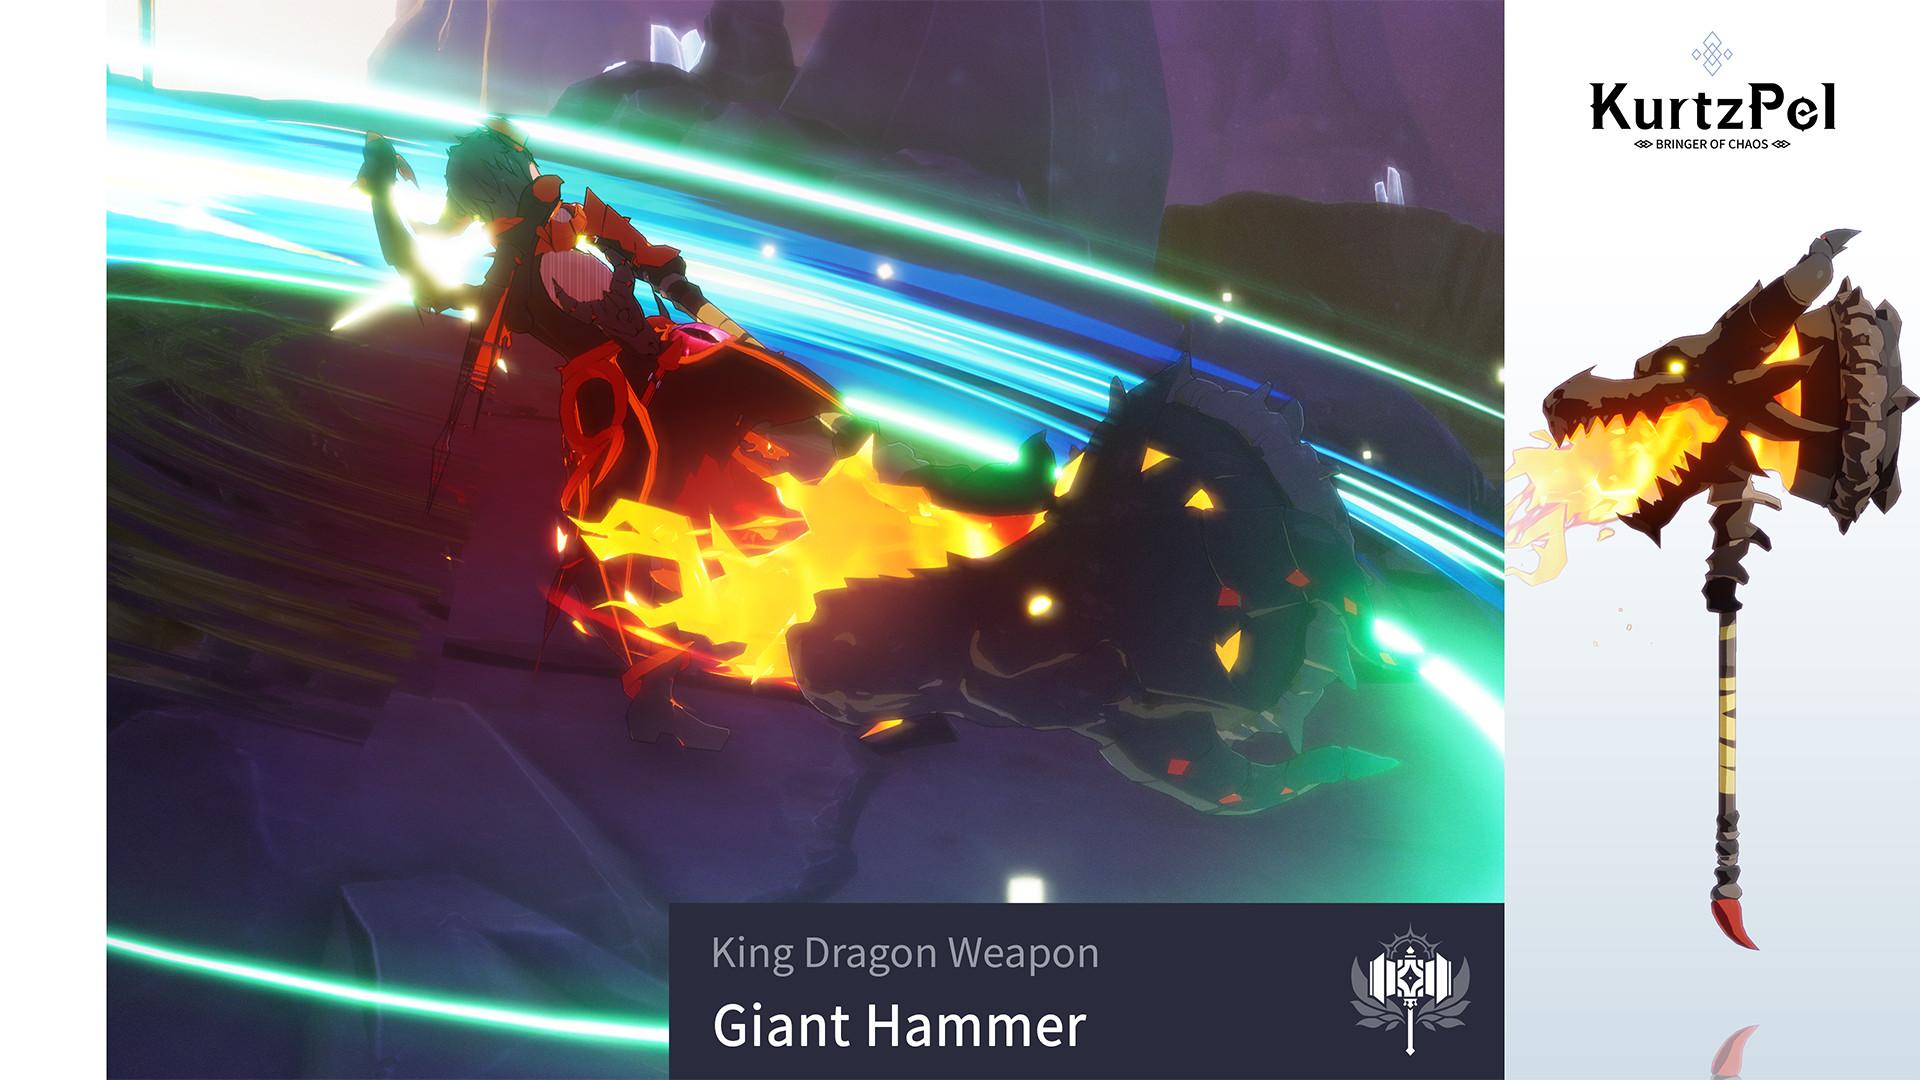 KurtzPel - King Dragon Giant Hammer screenshot